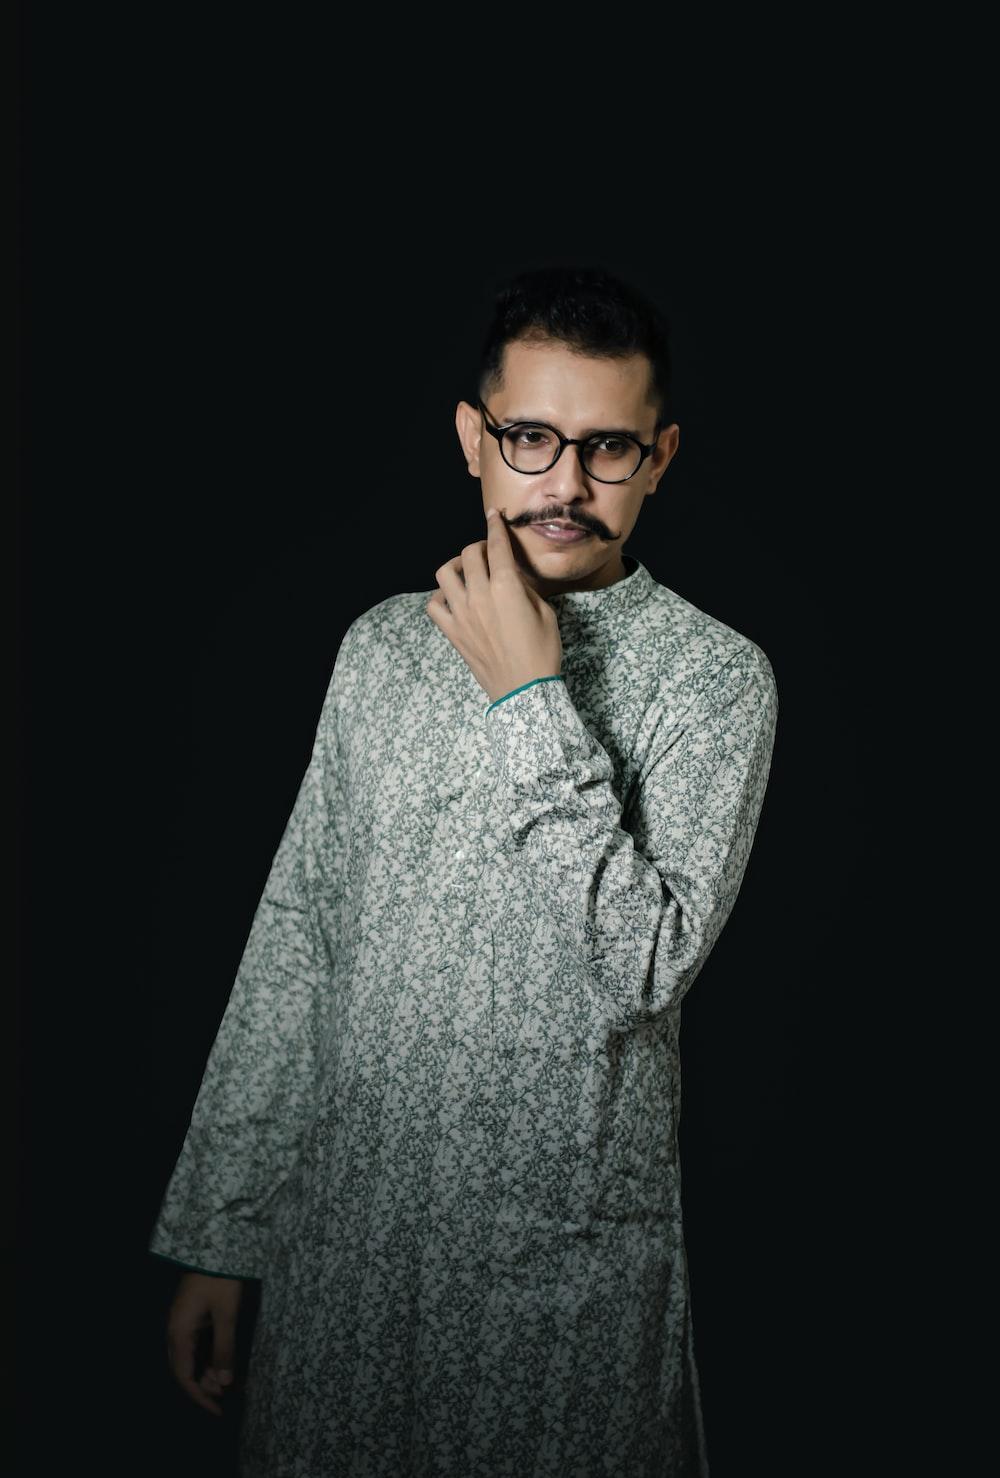 man in gray sweater wearing black framed eyeglasses